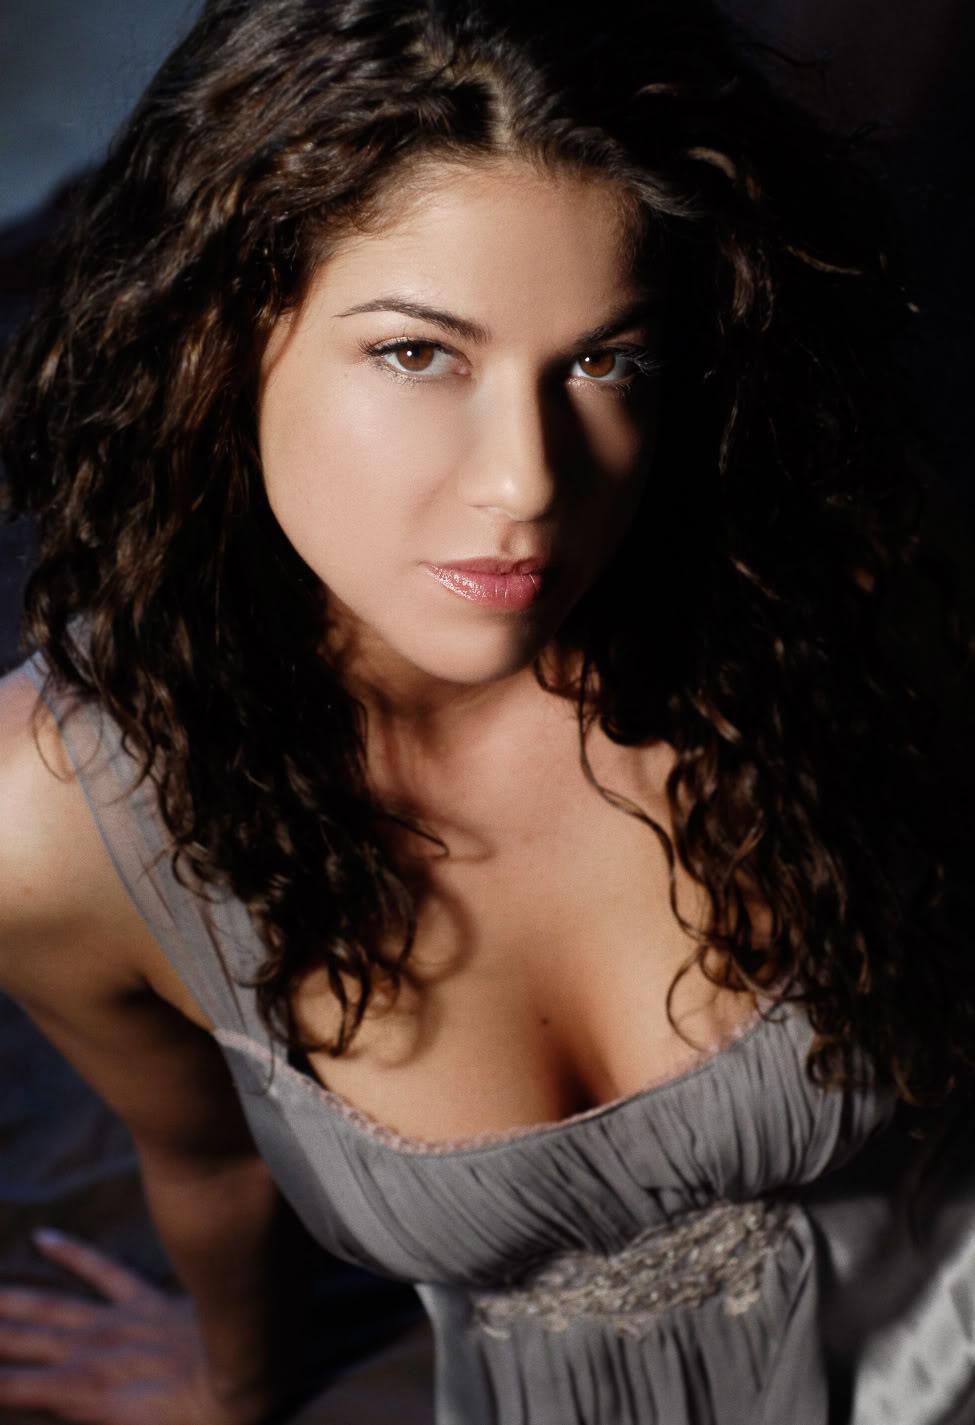 Luciana-Carro-Battlestar-Galactica-Caprica-and-Helix